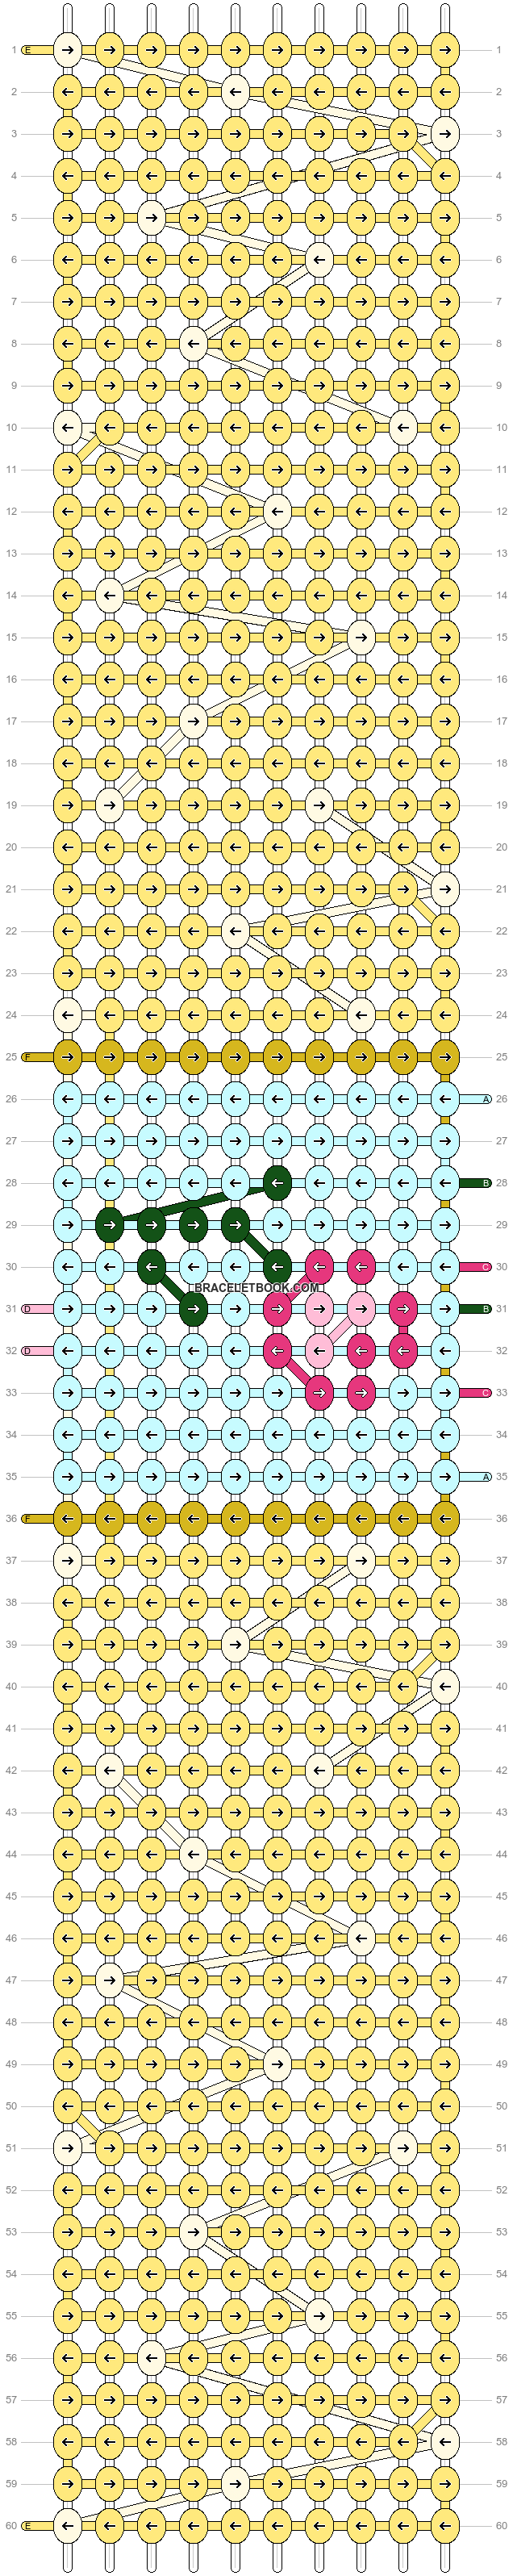 Alpha pattern #70845 pattern